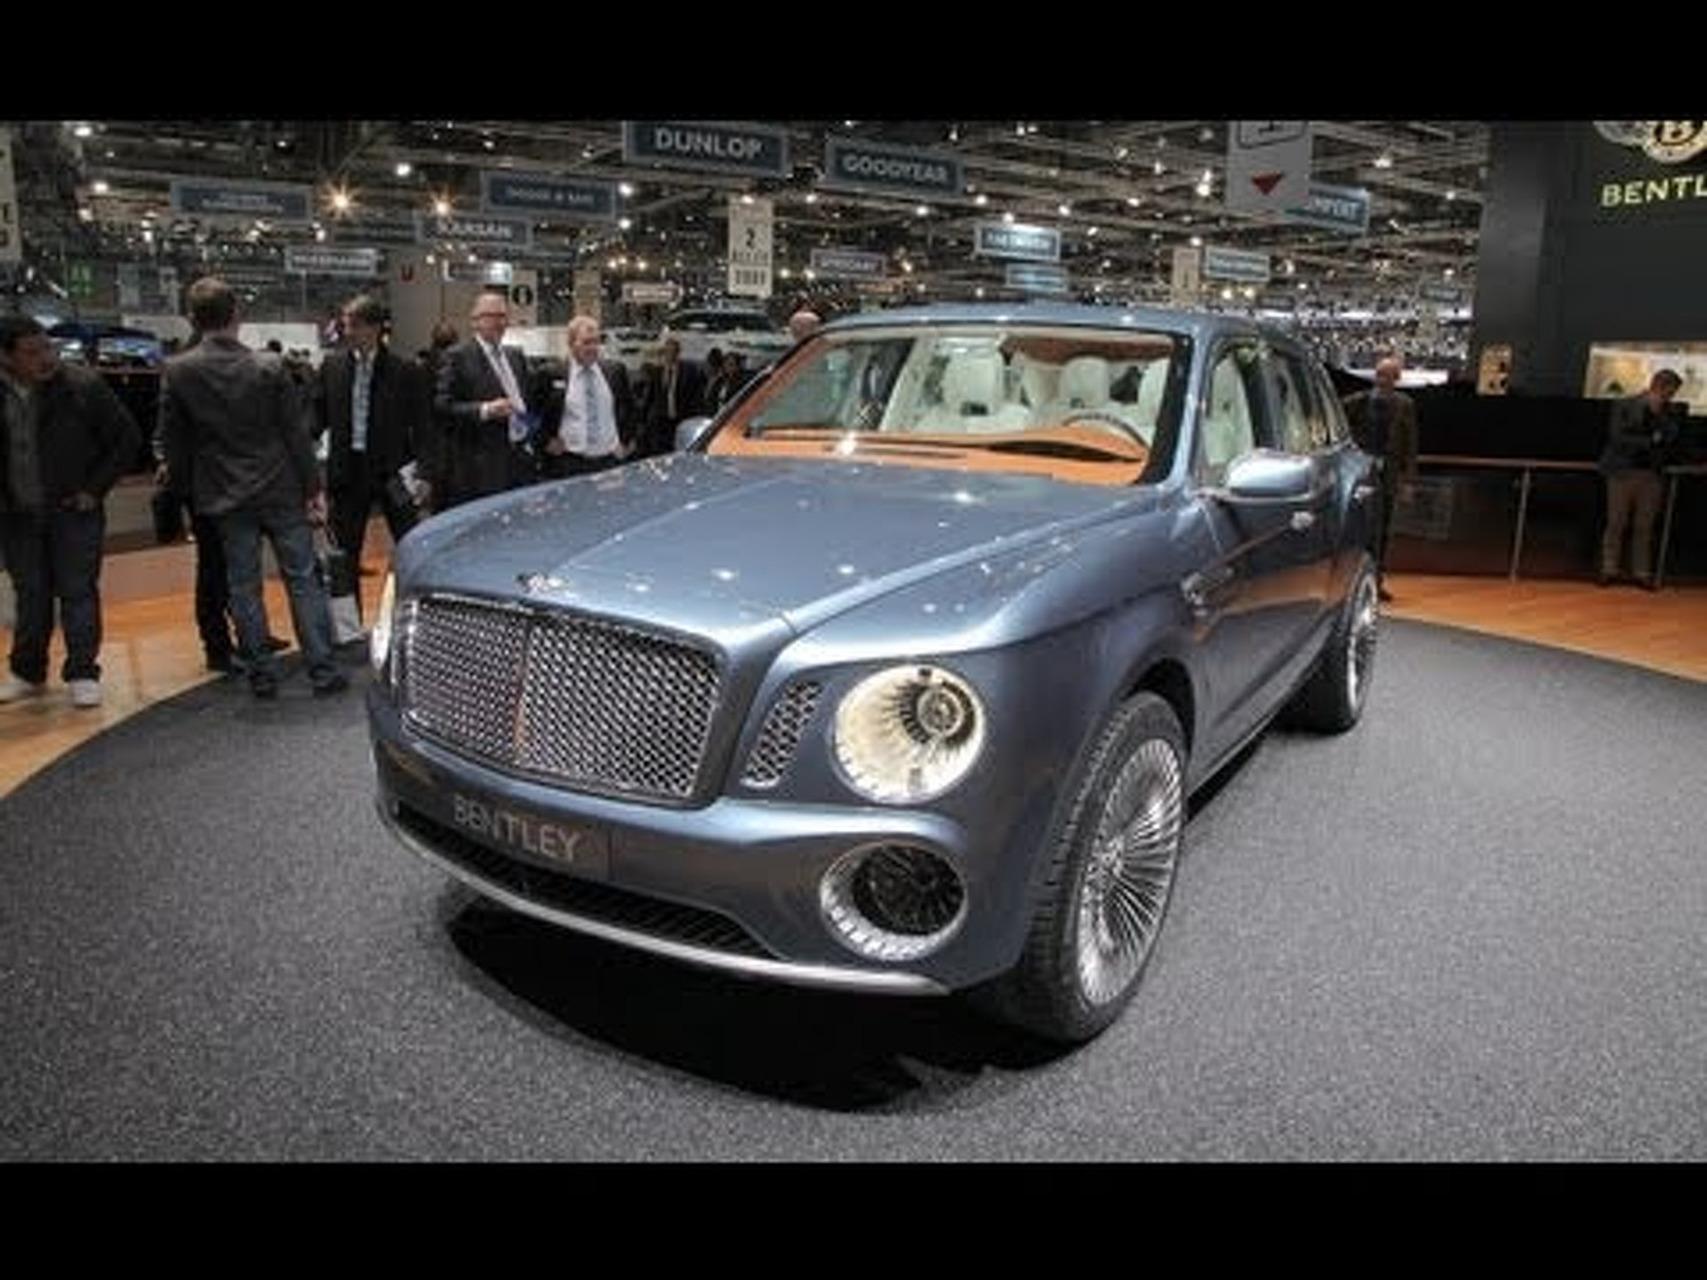 Bentley EXP 9 F Concept @ 2012 Geneva Auto Show